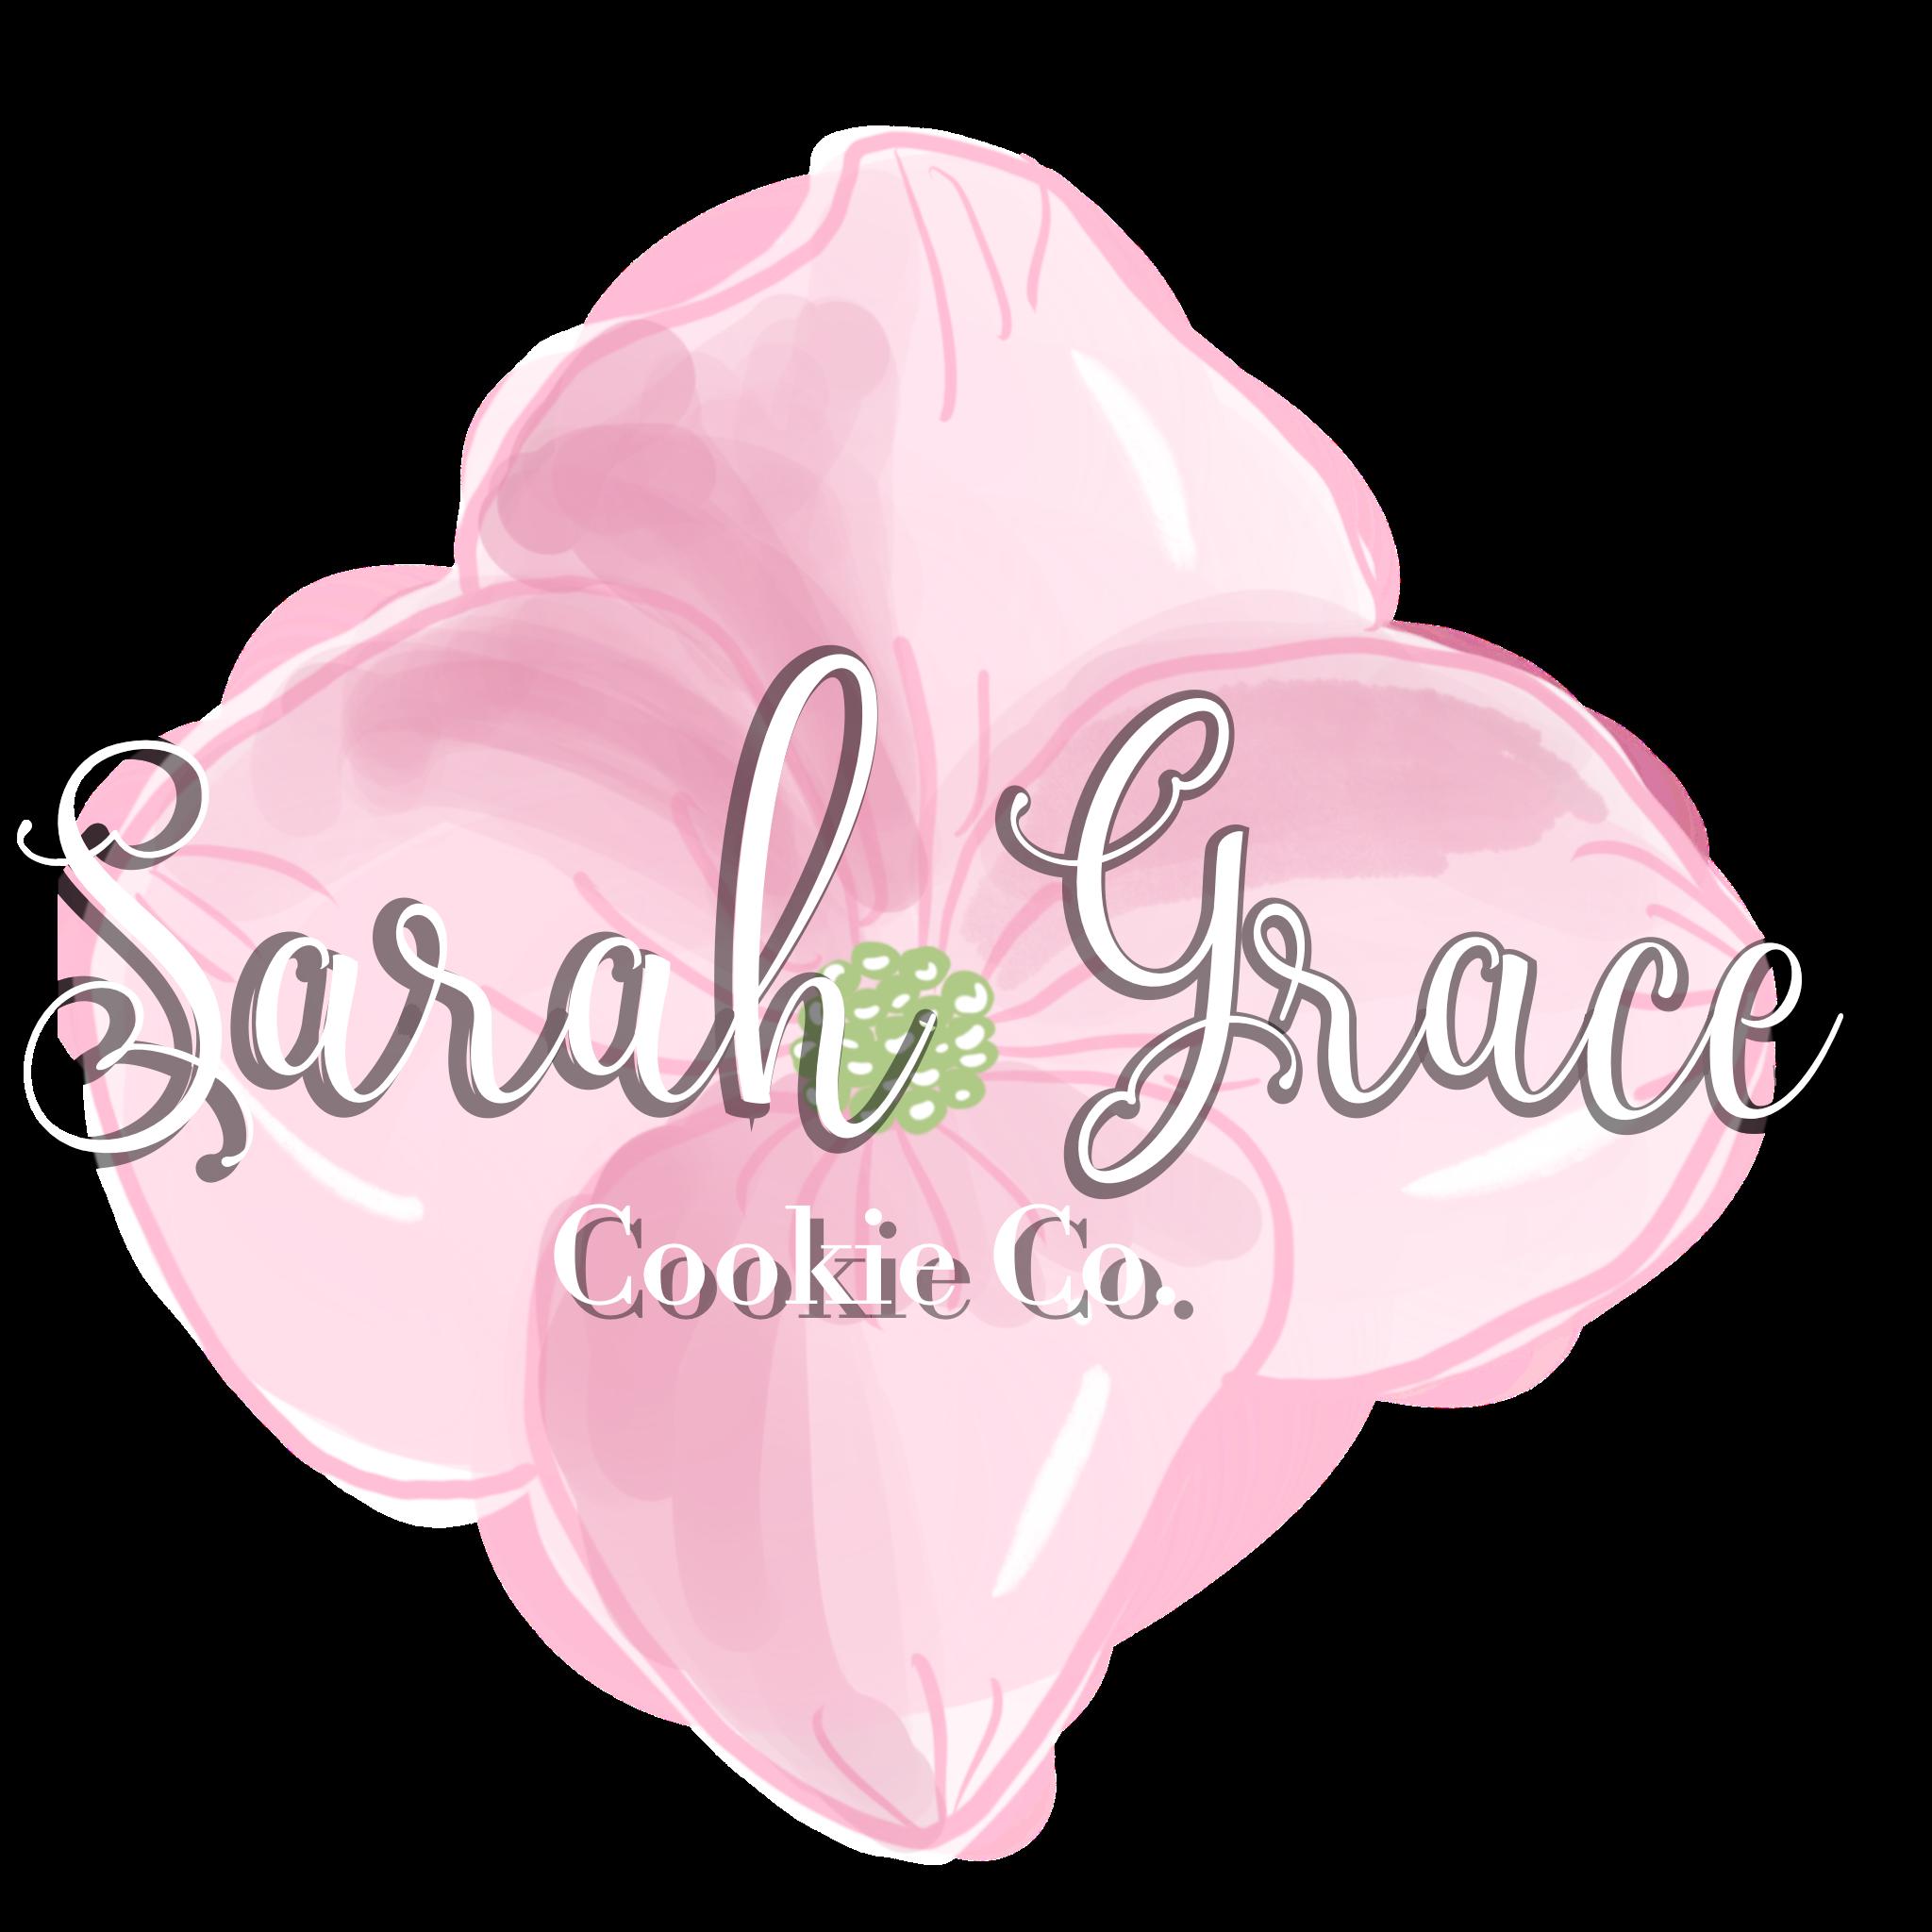 Sarah Grace Cookie Co logo